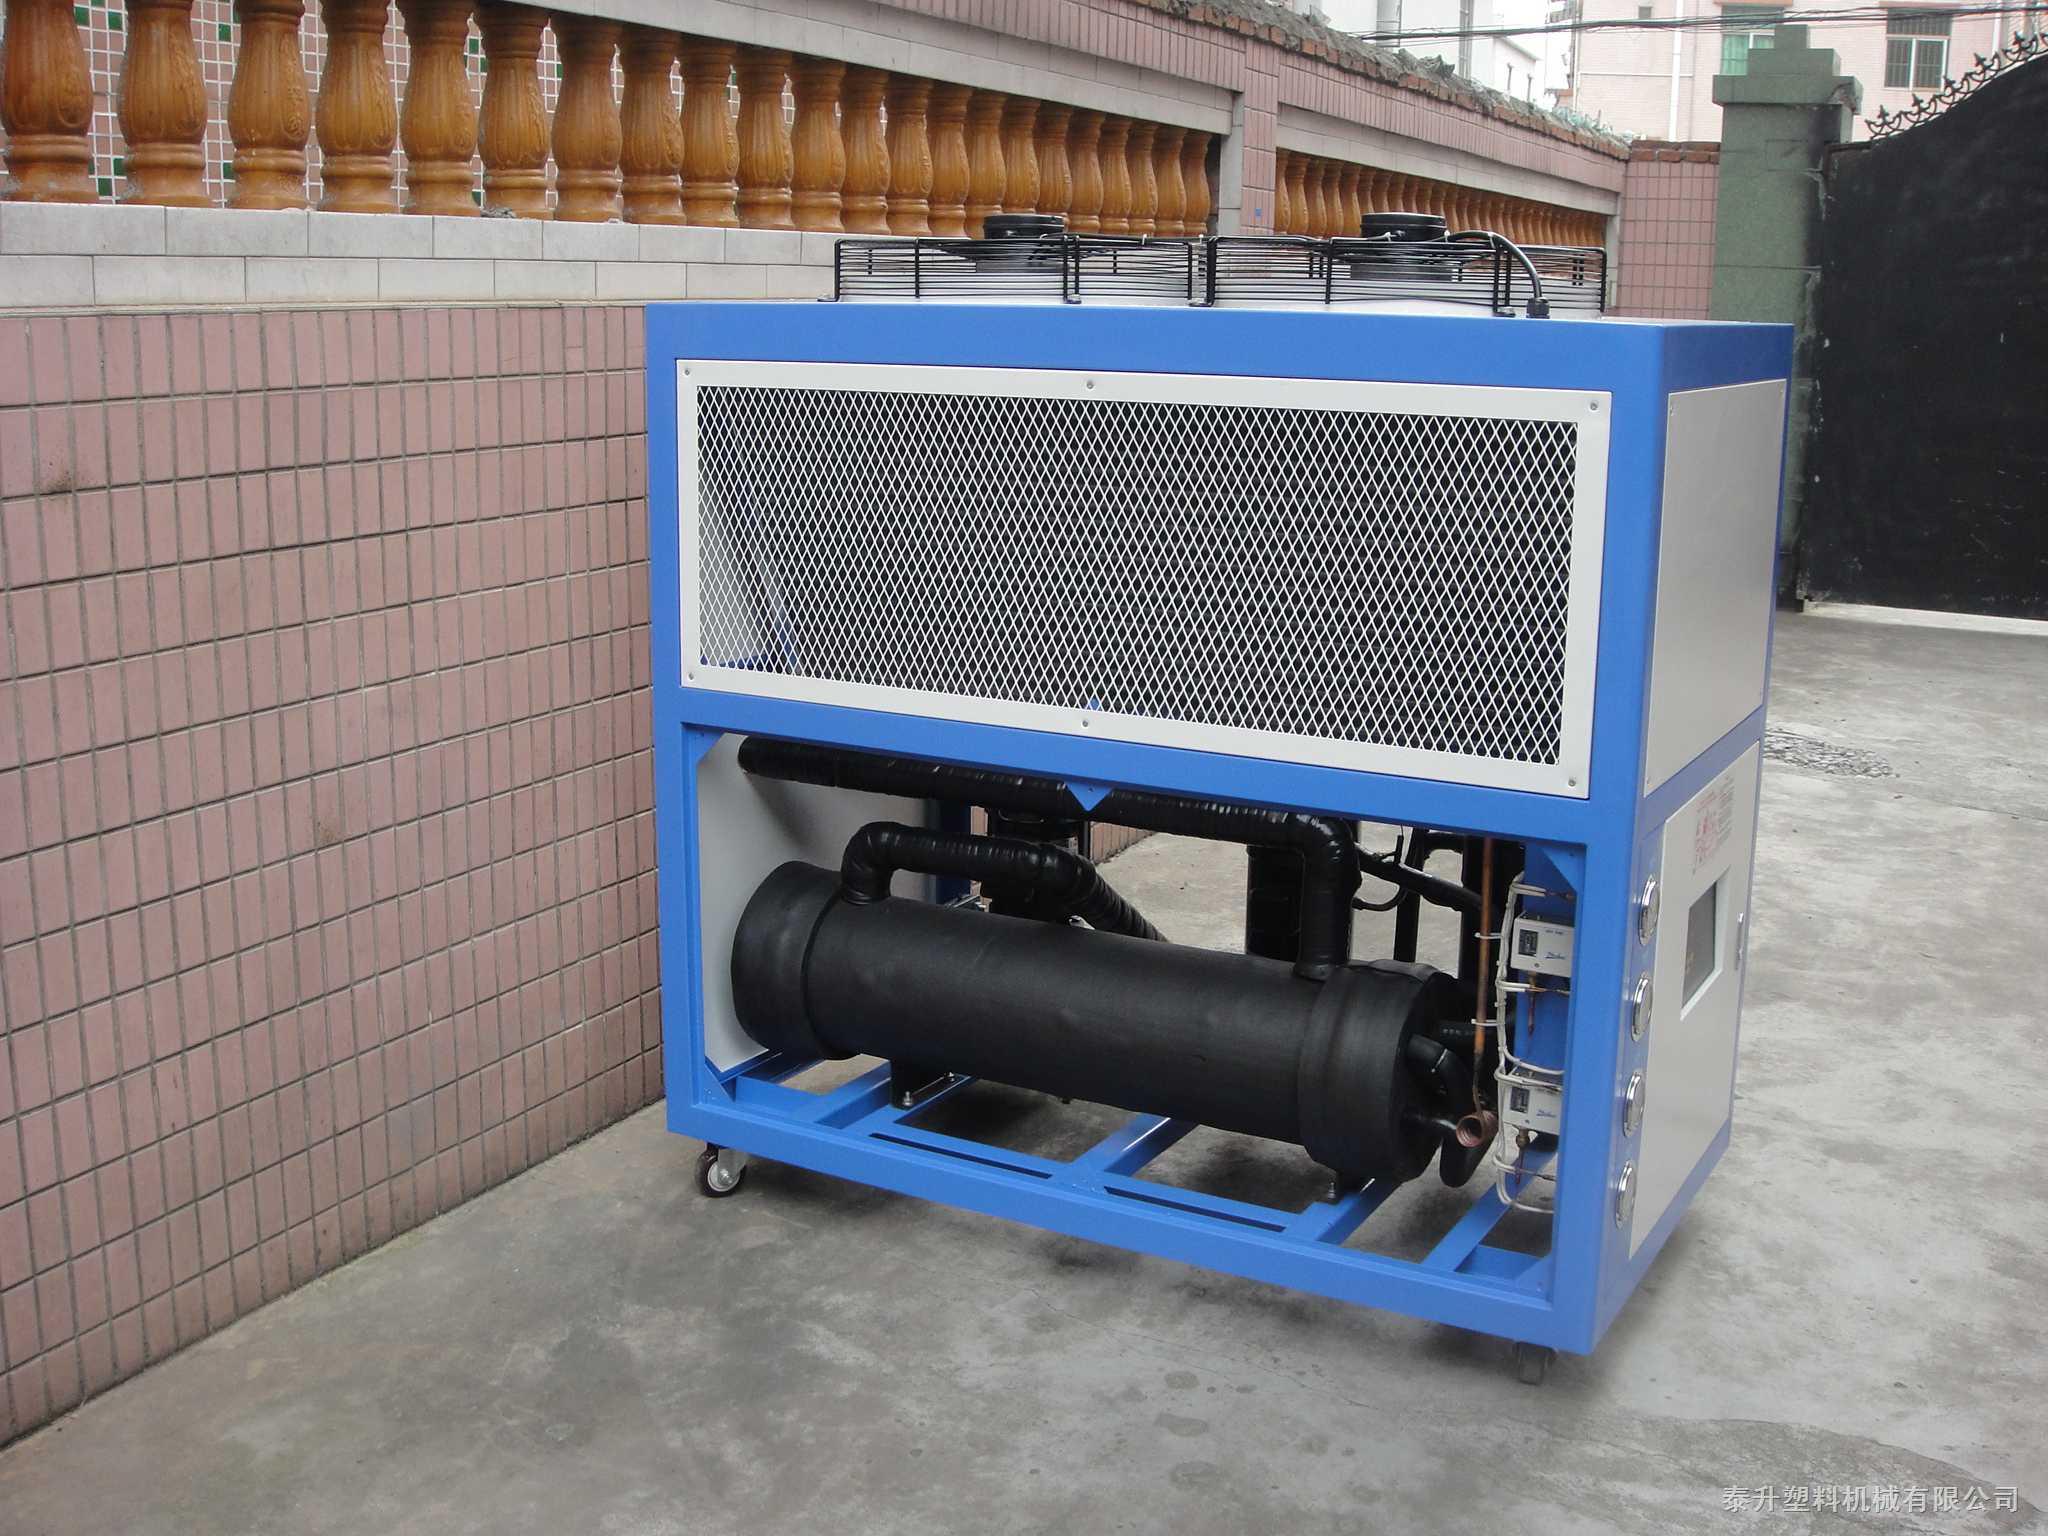 5kw工业冷水机,大金压缩机冷冻机